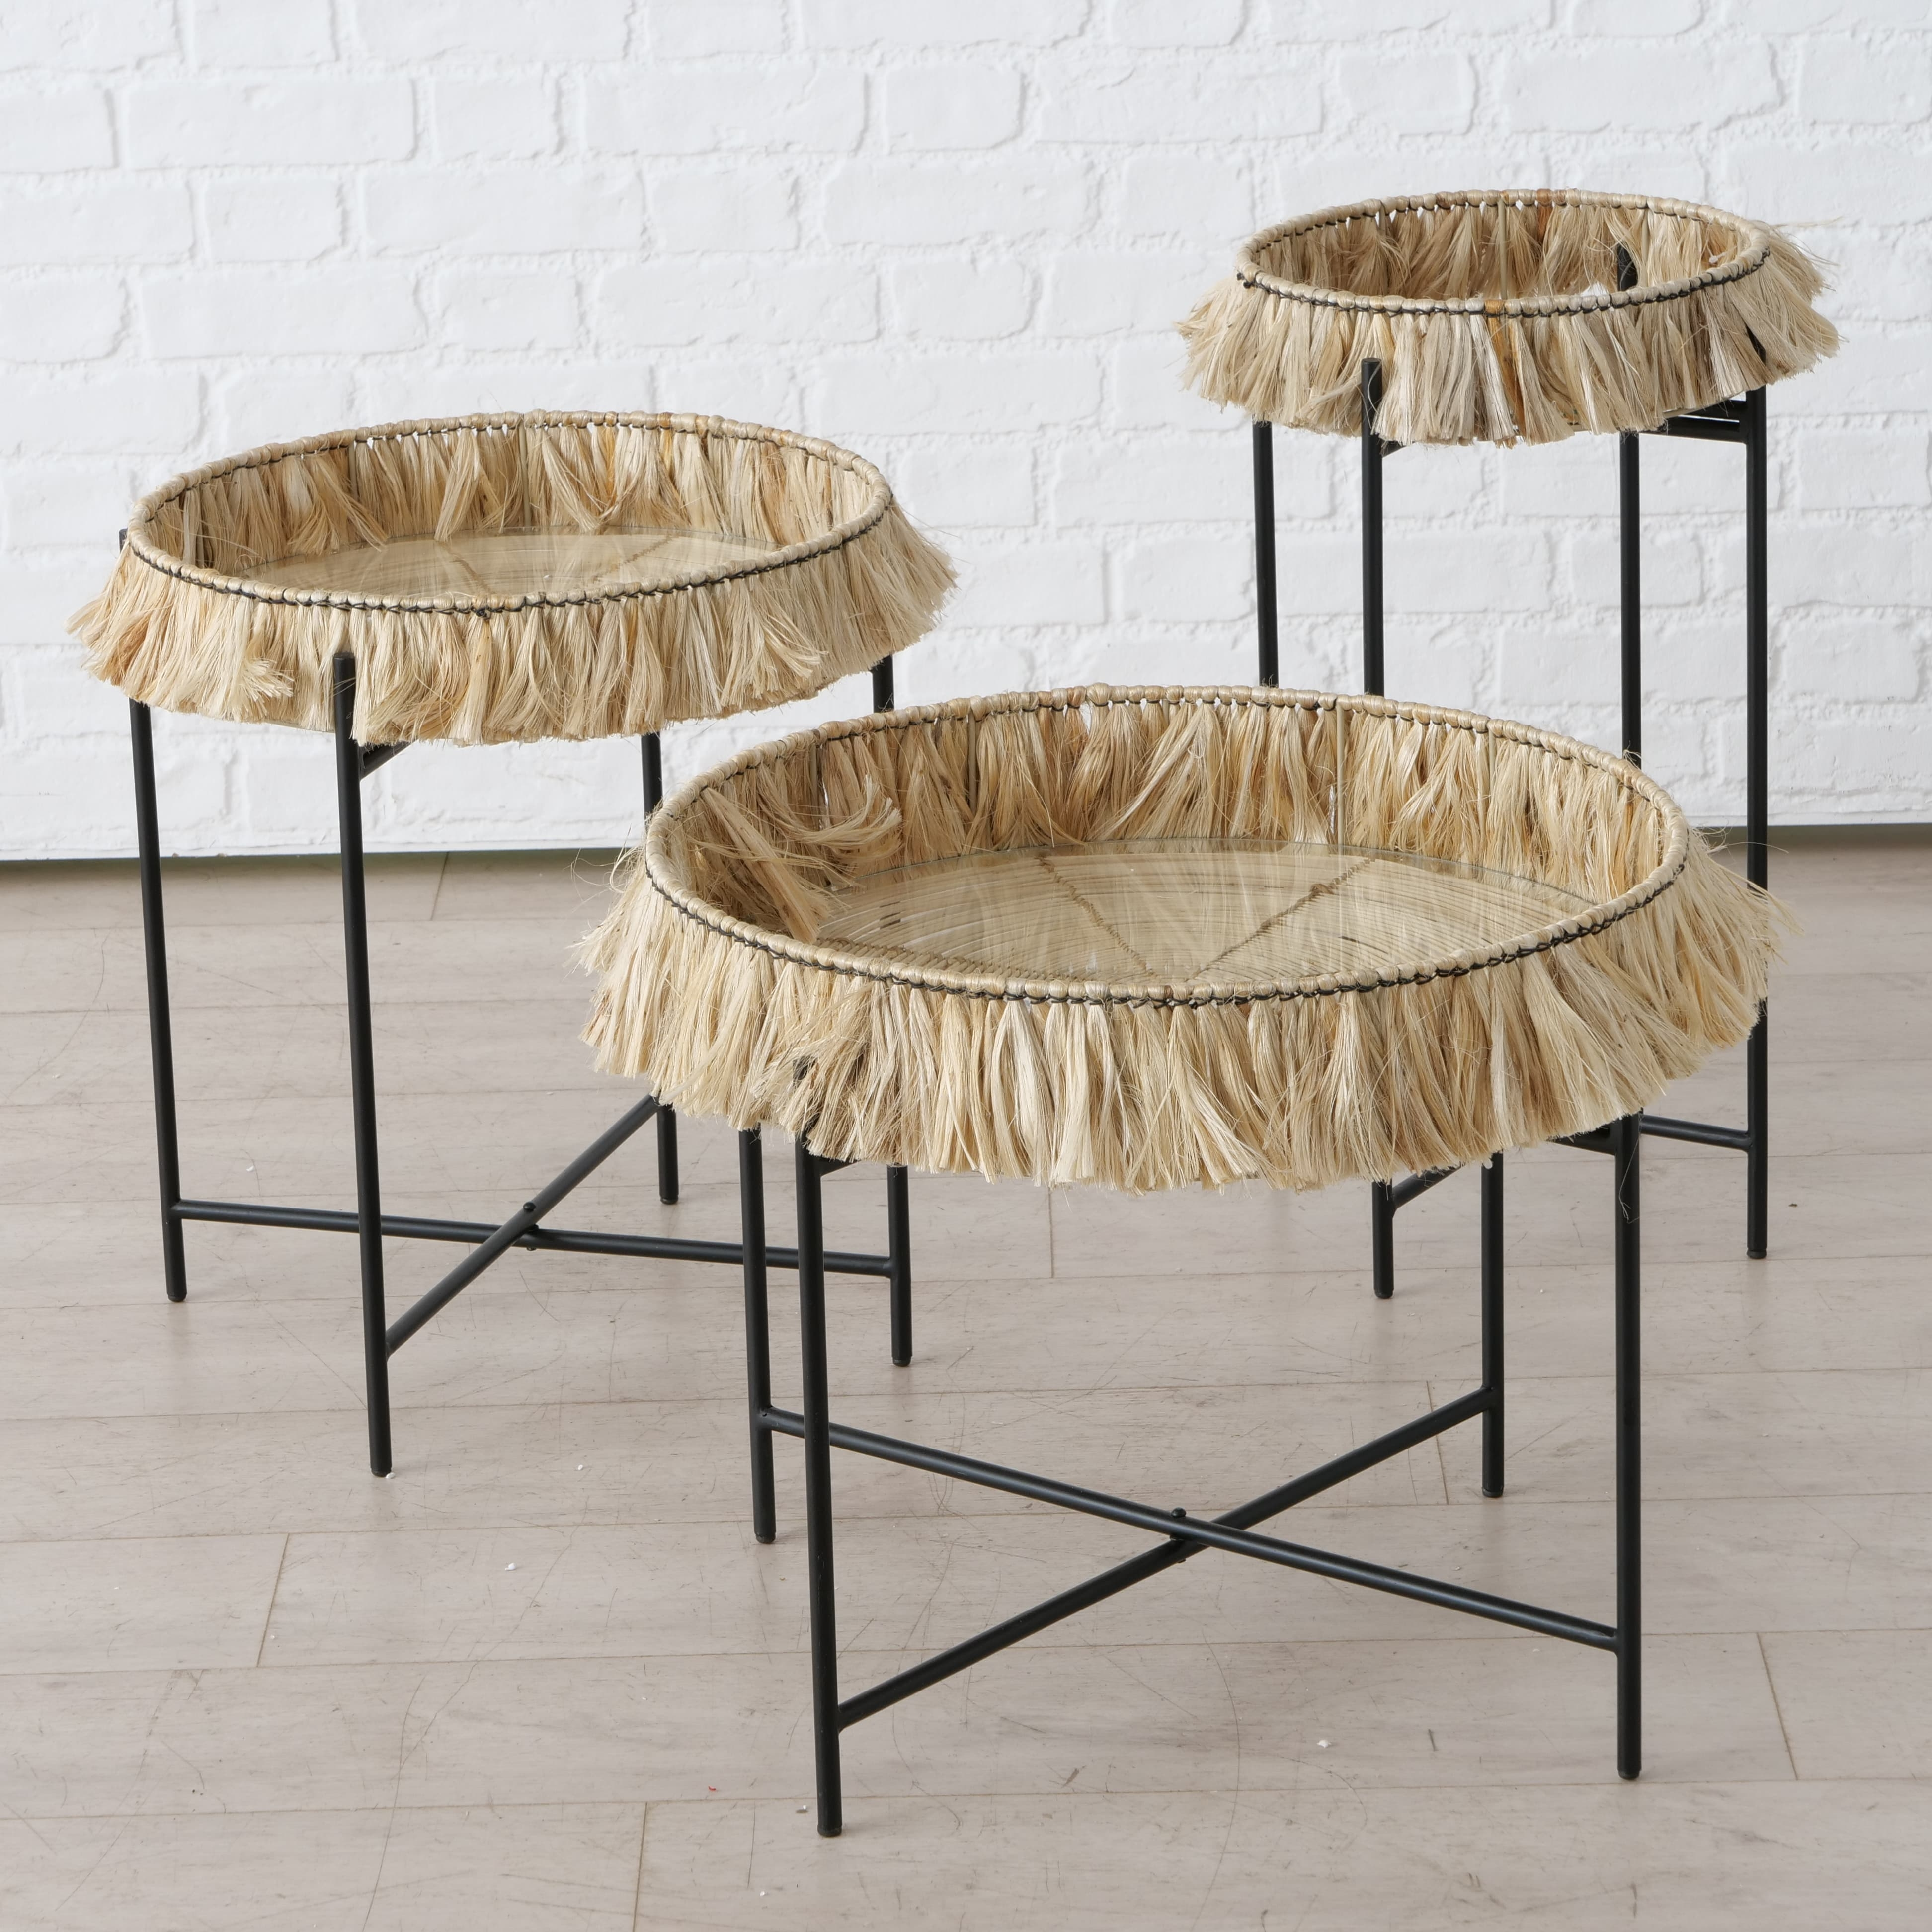 Set 3 masute de cafea din sticla, bambus si metal Banjar Negru / Natural, Ø57xH48 / Ø47xH54 / Ø33xH65 cm poza